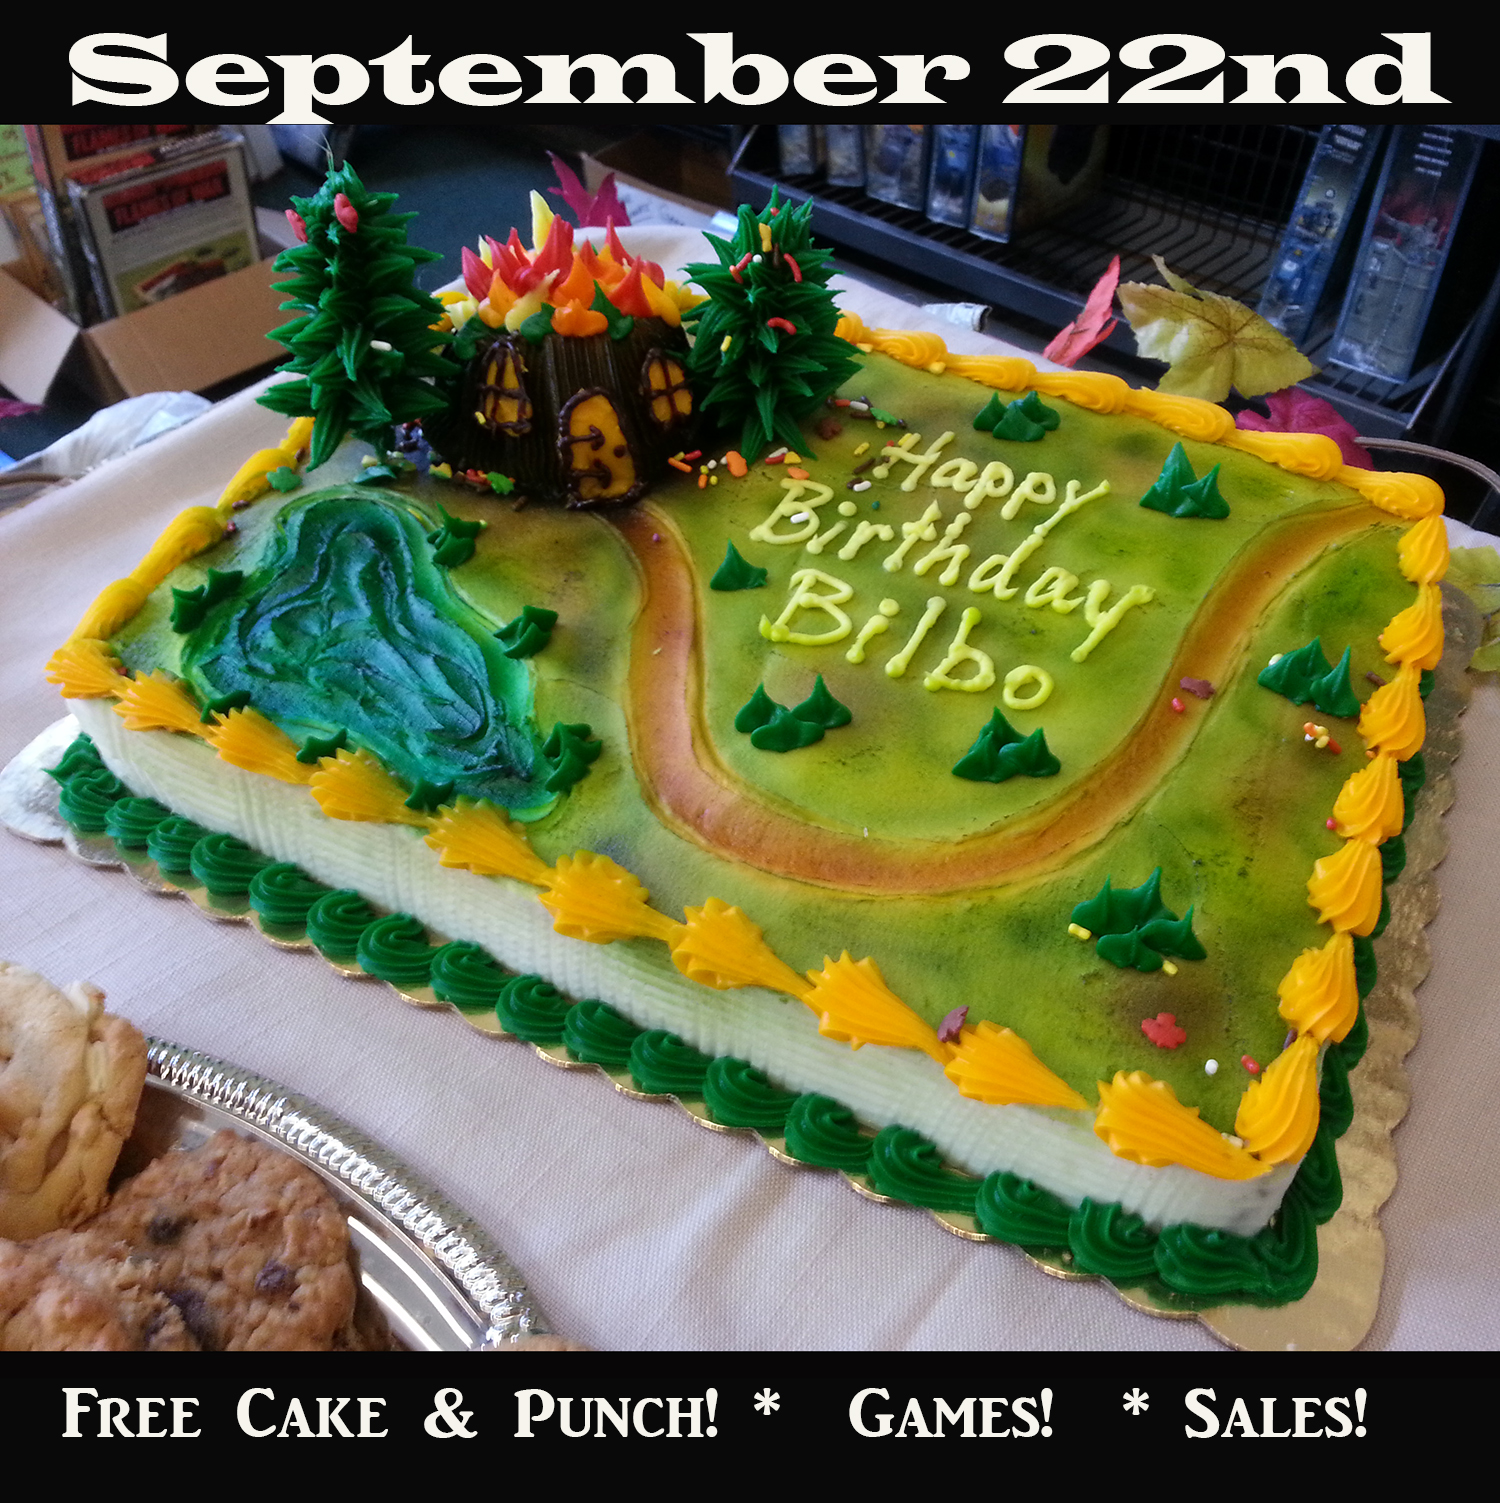 Bilbos Birthday Party Sept. 22nd at DOKS